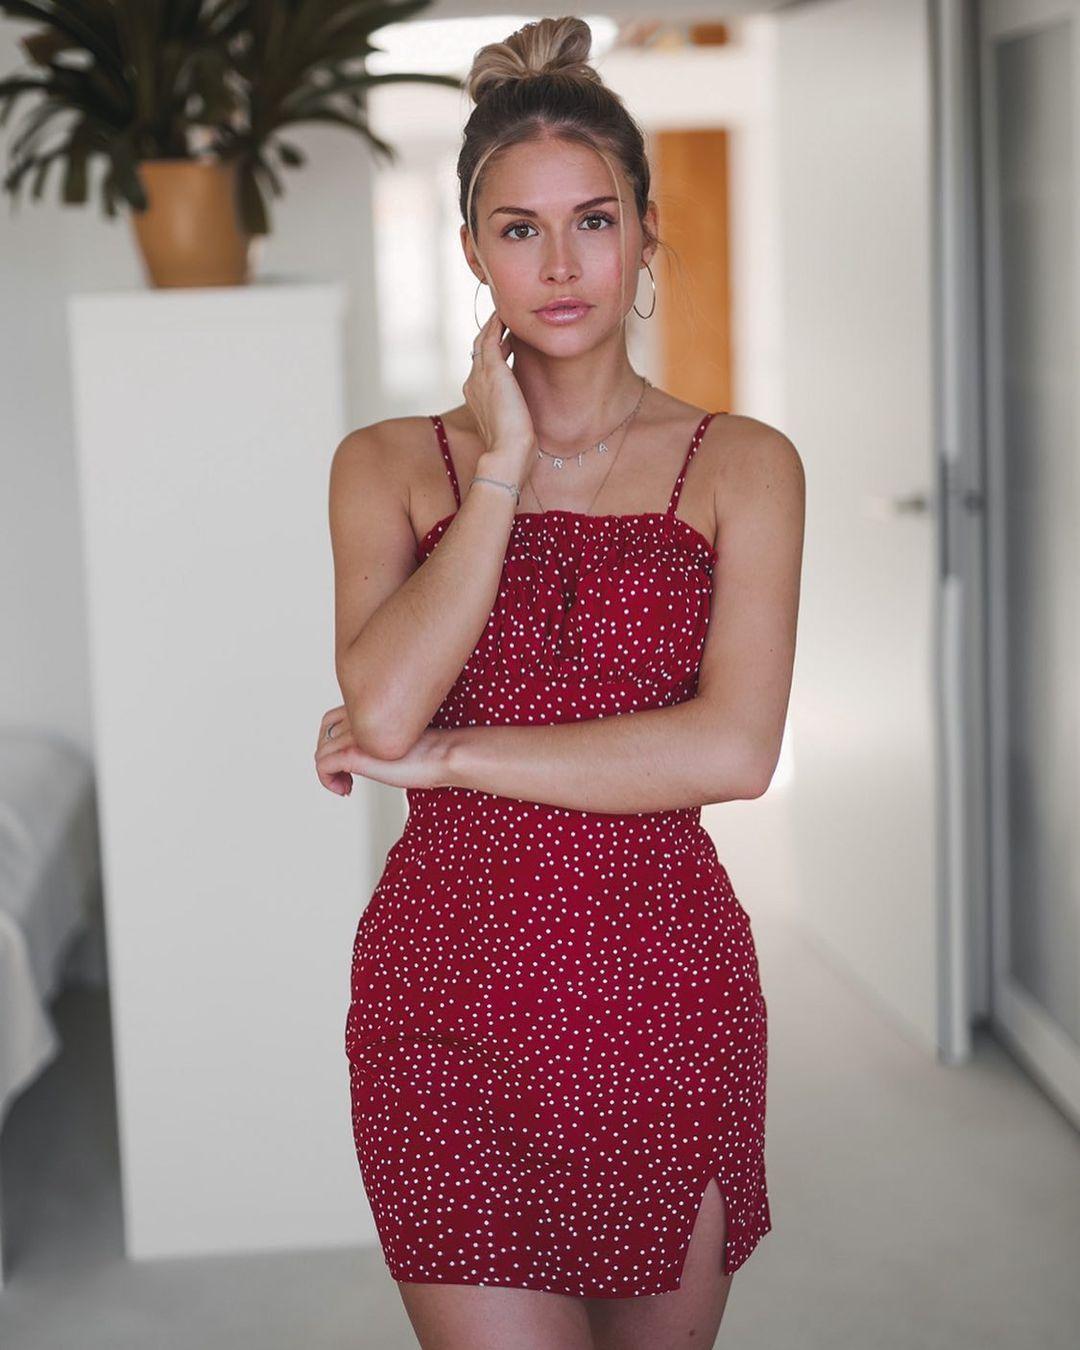 Maria-Luisa-Medack-Wallpapers-Insta-Fit-Bio-1